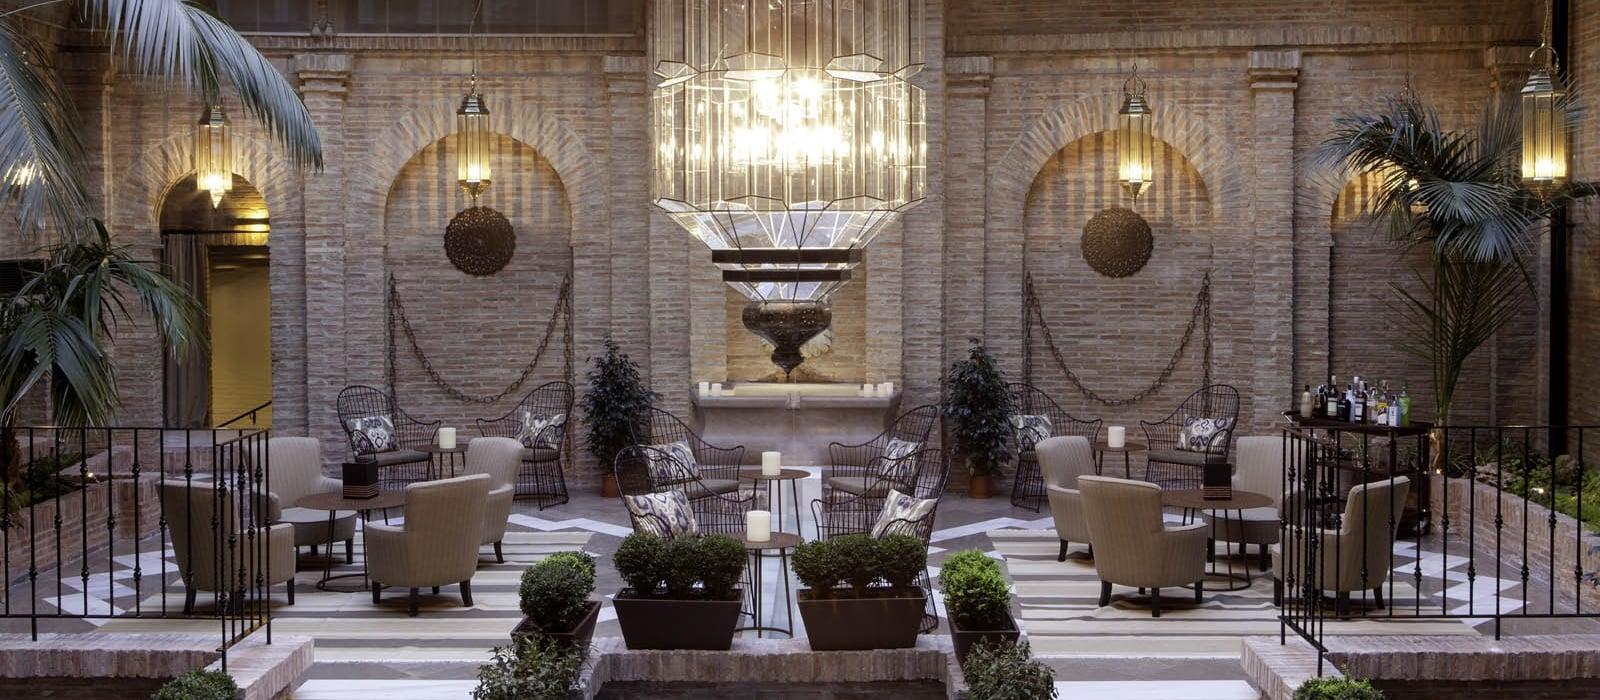 Servicios Hotel Granada Albayzín - Vincci Hoteles - Salones